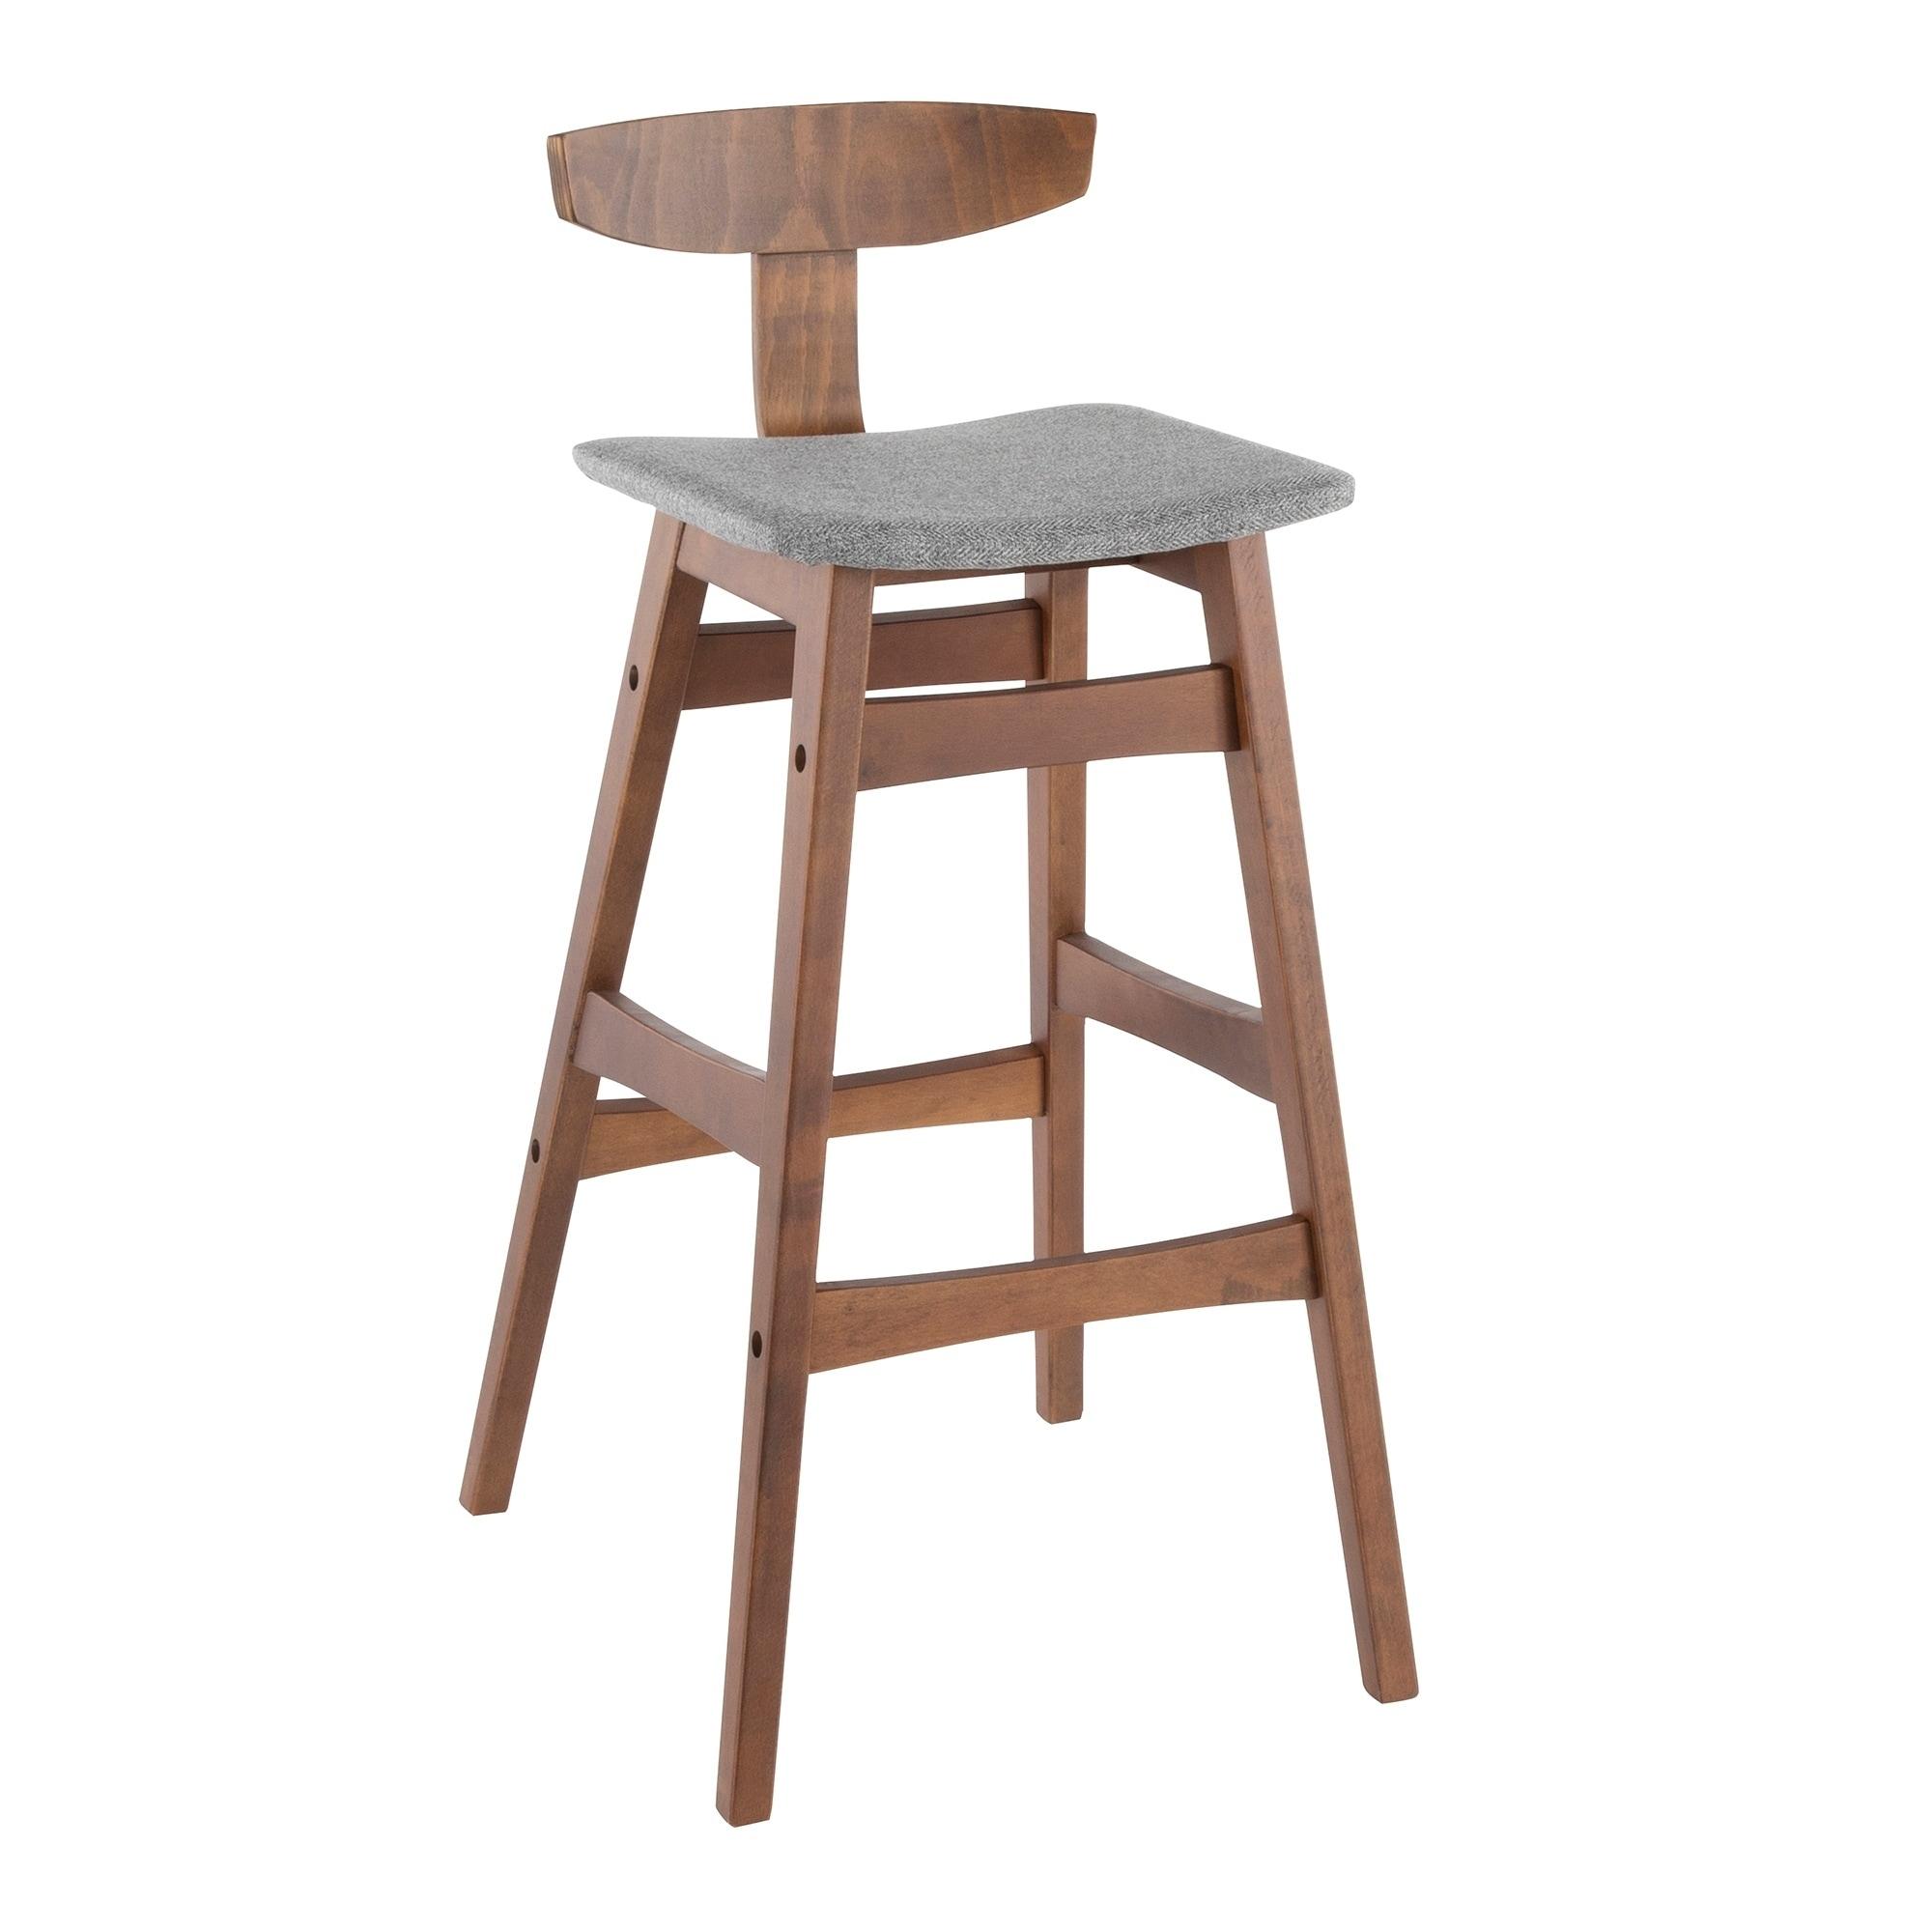 Super Copper Grove Adorf Mid Century Modern Bar Stool Cjindustries Chair Design For Home Cjindustriesco